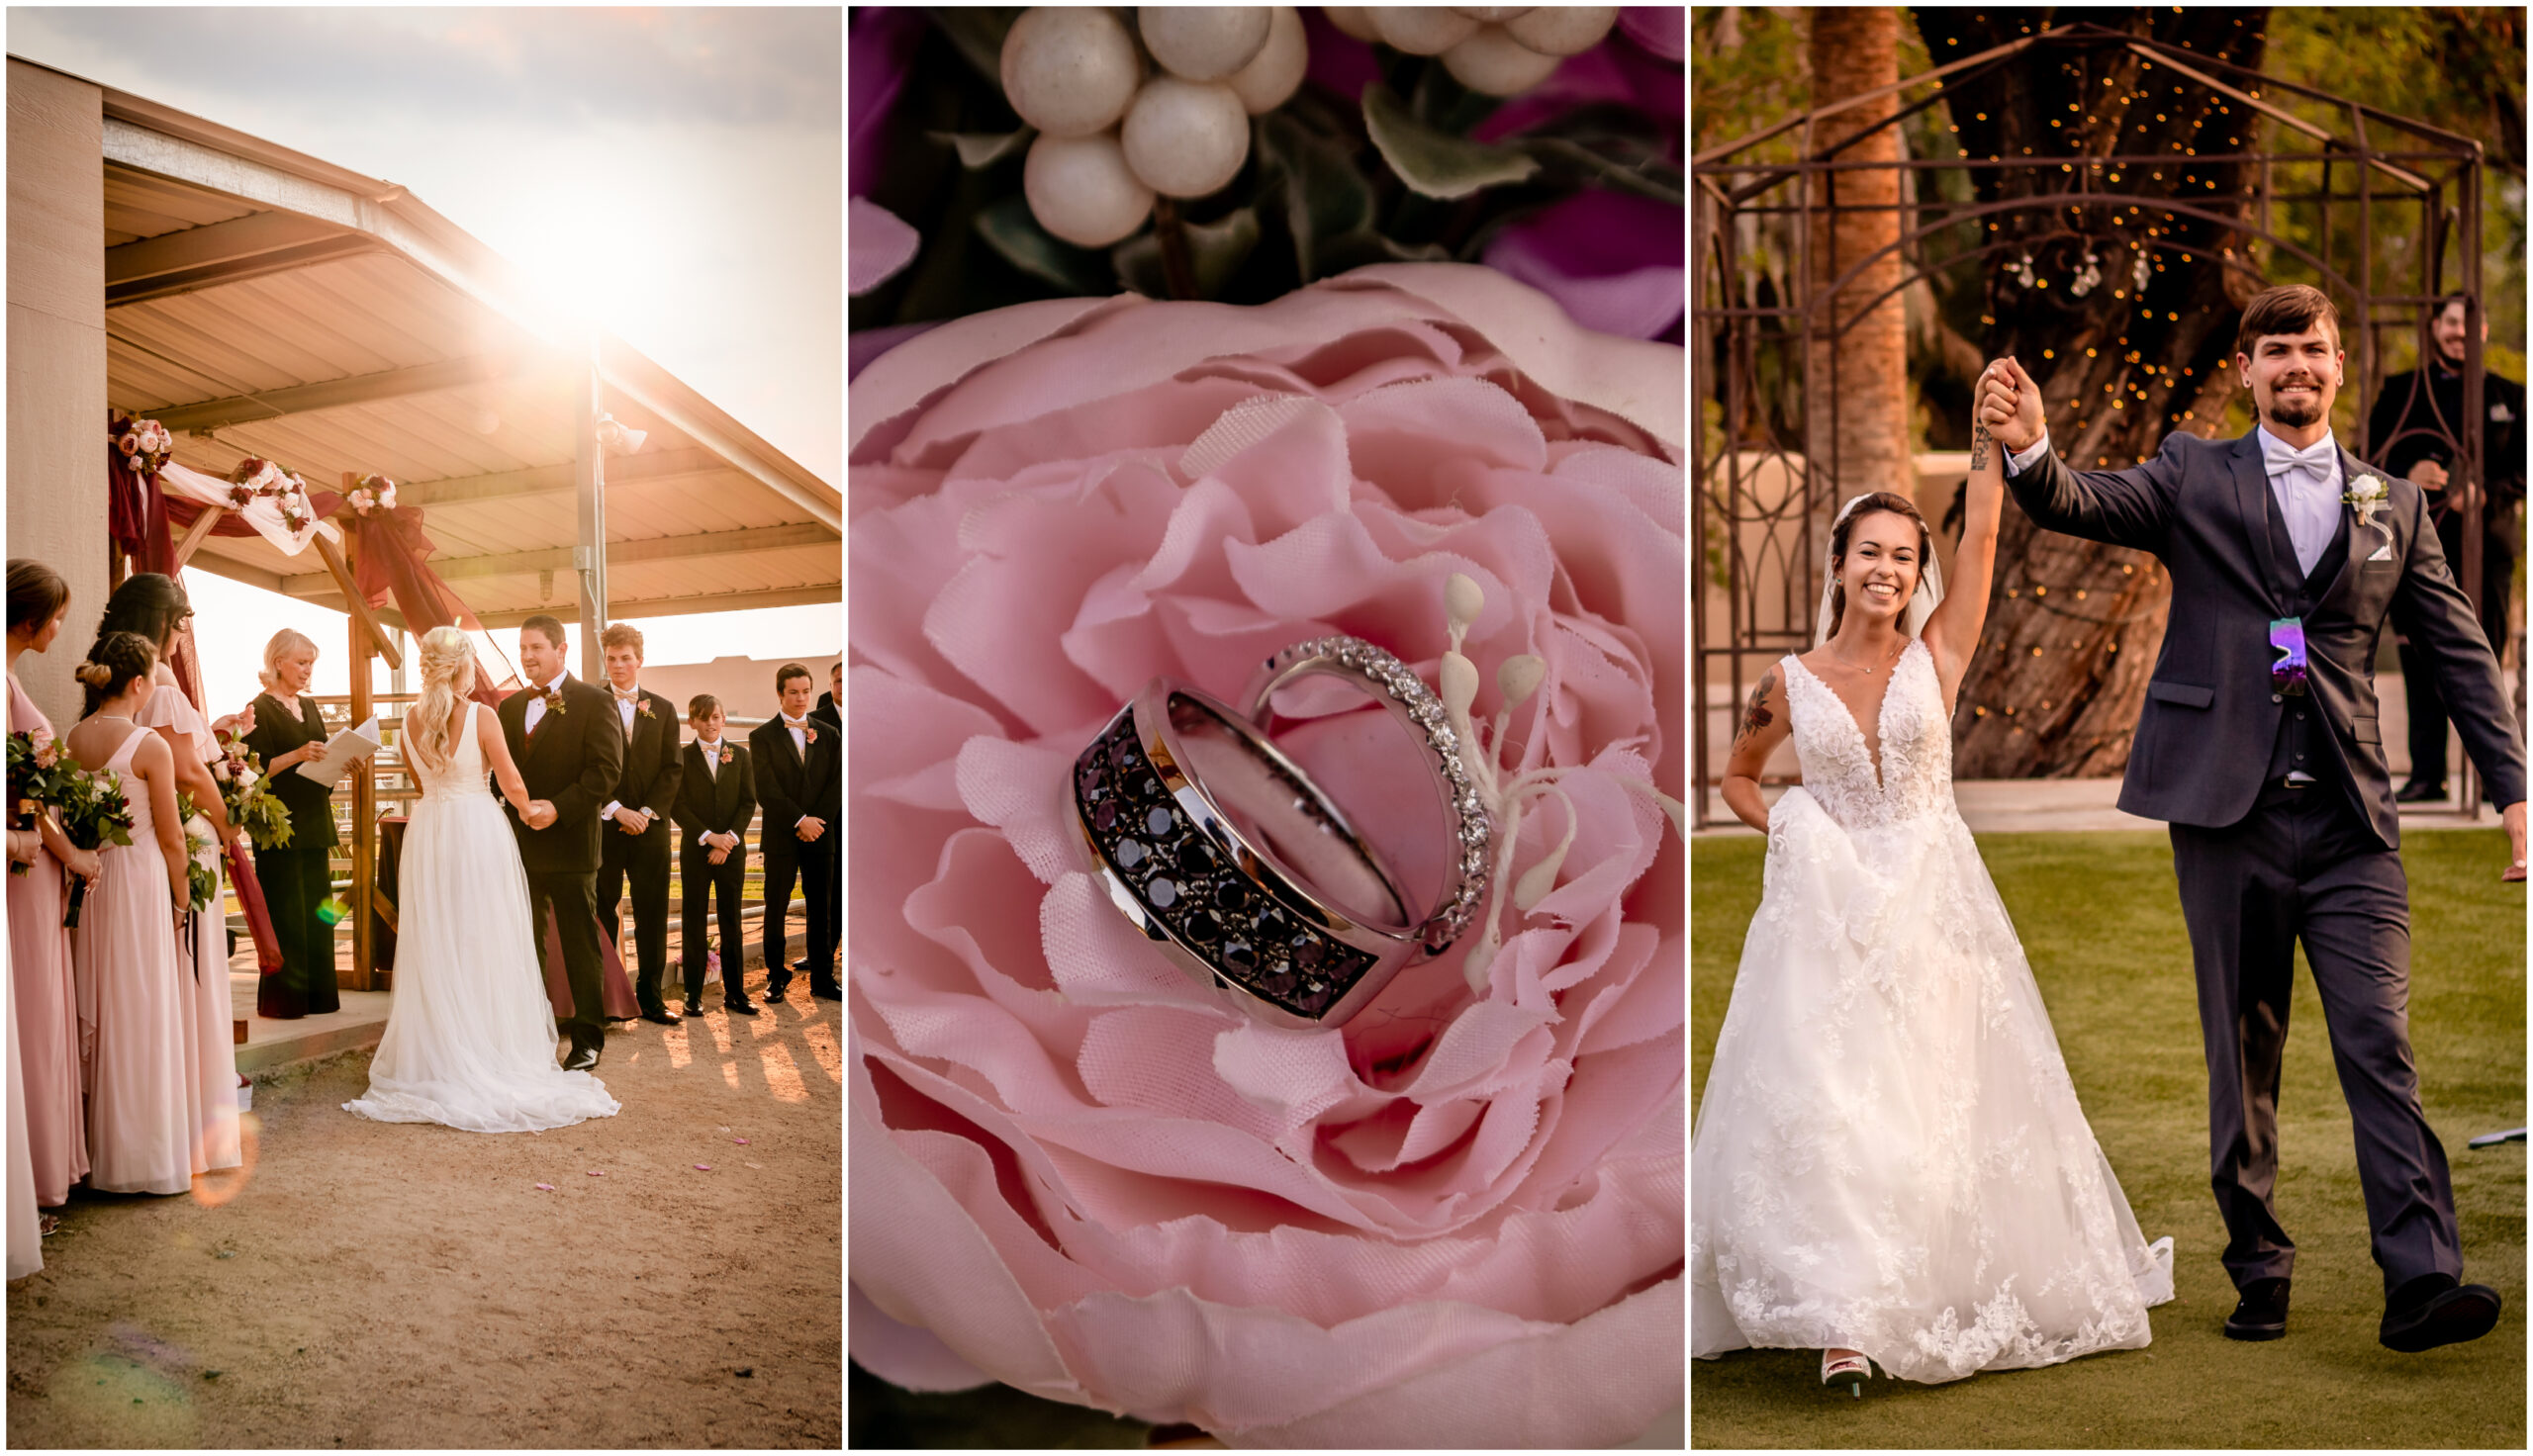 wedding, photo, photographer, photography, phoenix, az, arizona, goodyear, litchfield park, glendale, scottsdale, avondale, peoria, surprise, bride, groom, knot, wire